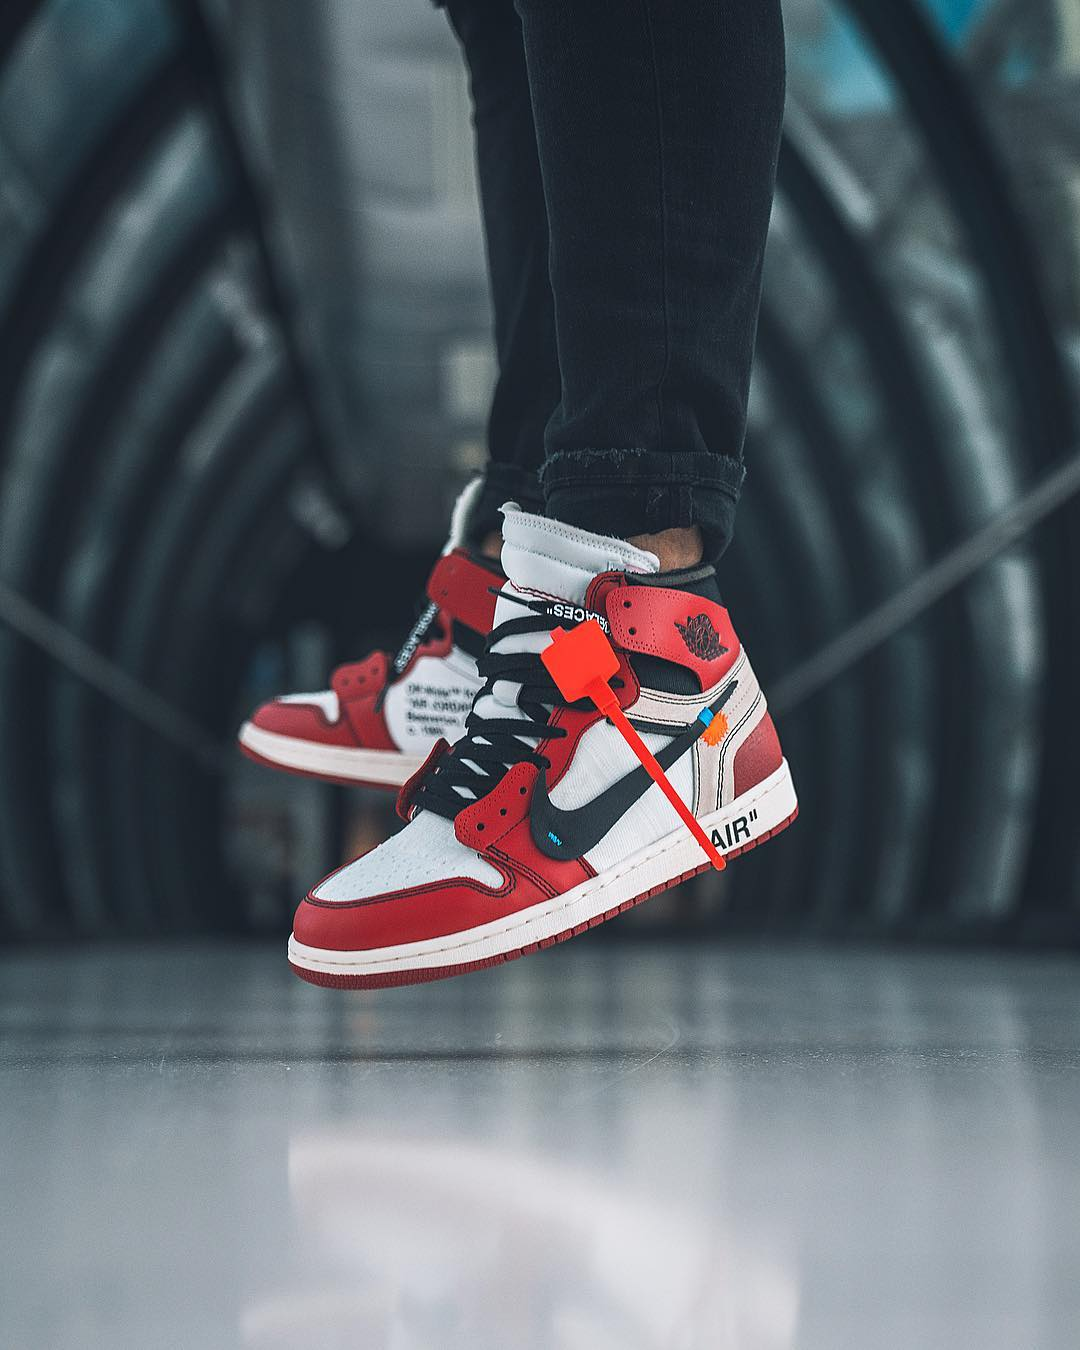 Jordan Lift Off Weiß Schuhe für Herren Online Shop, Jordan